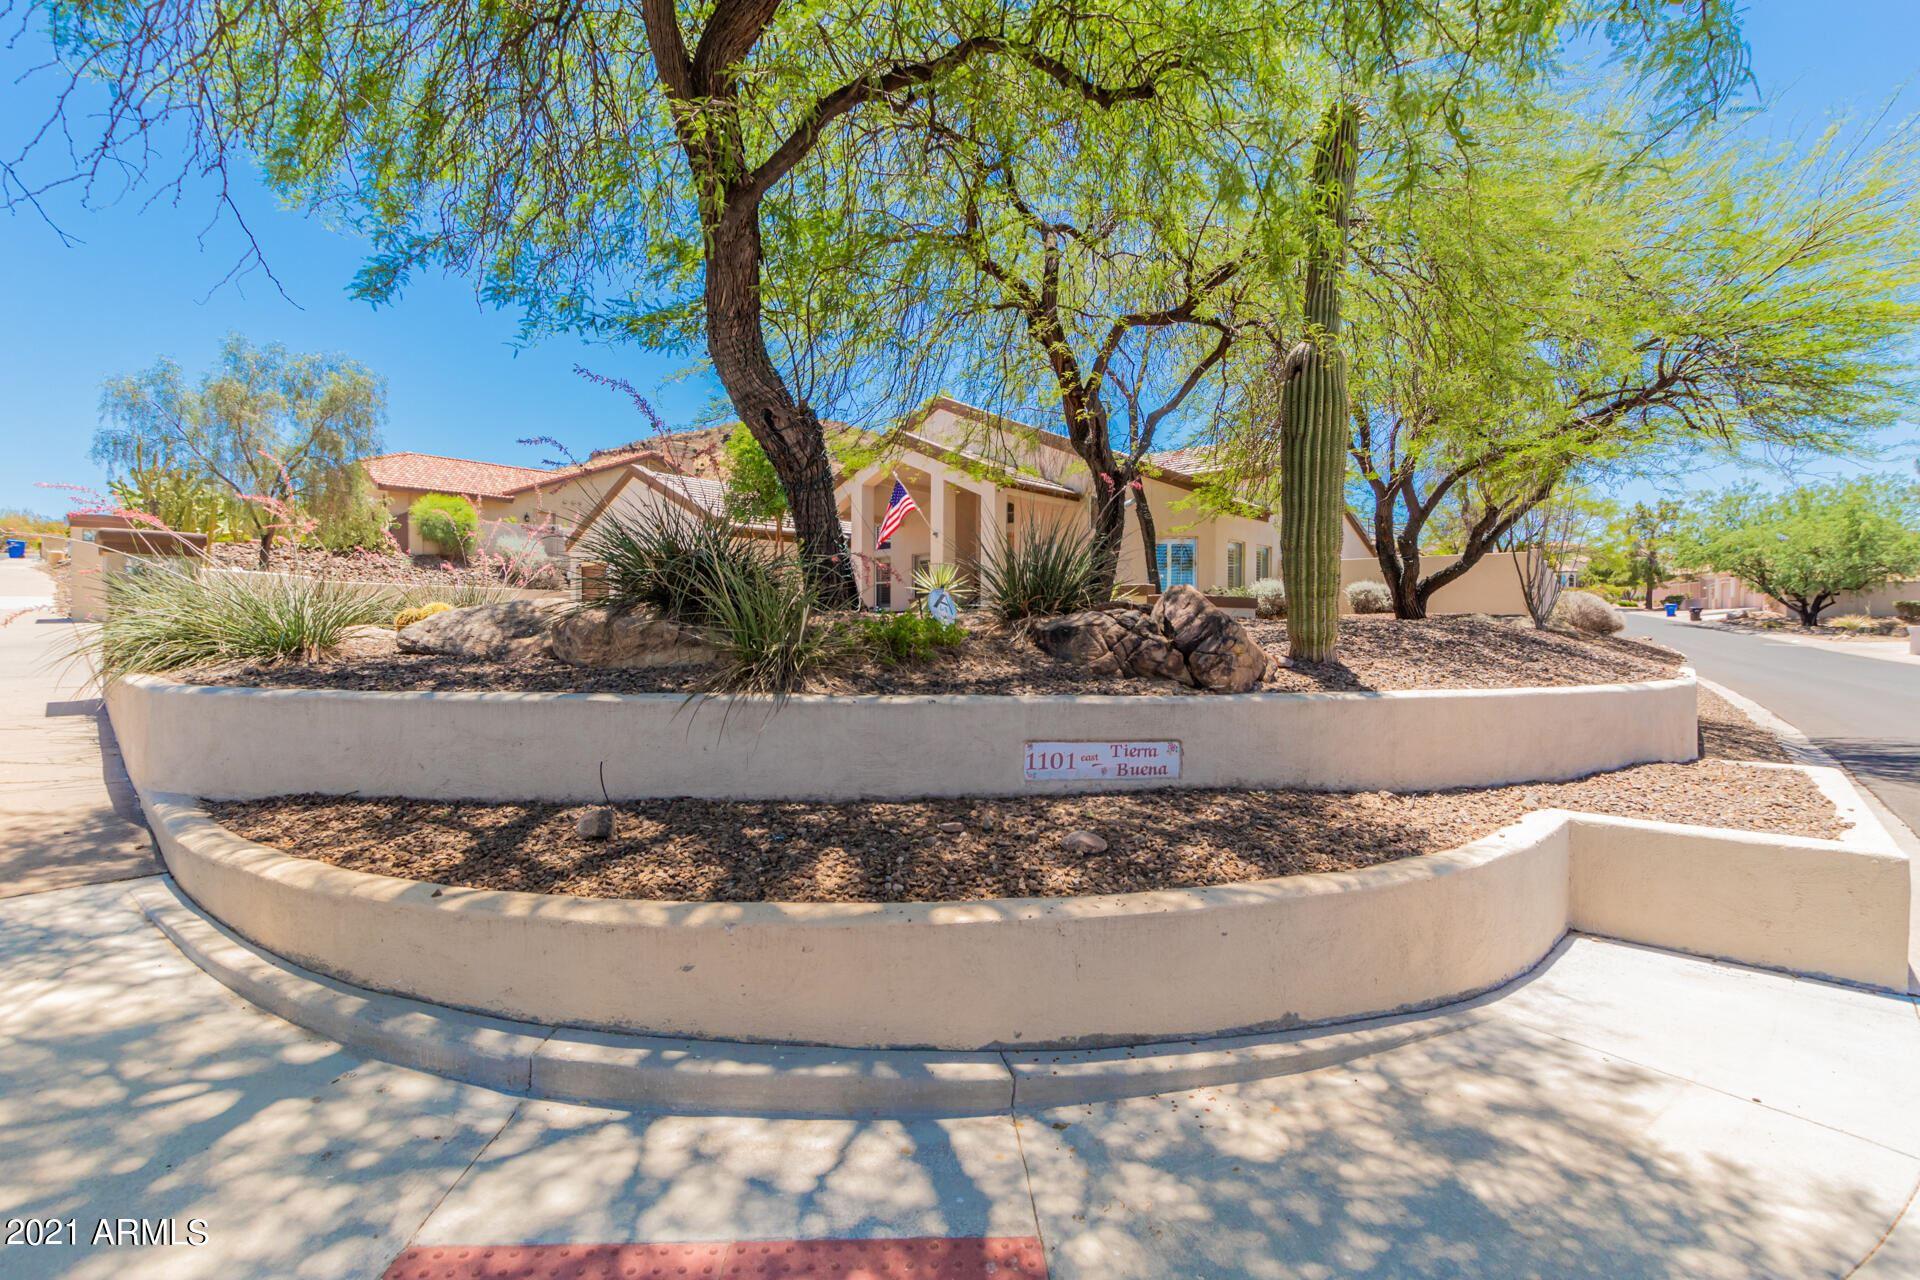 1101 E TIERRA BUENA Lane, Phoenix, AZ 85022 - MLS#: 6243341